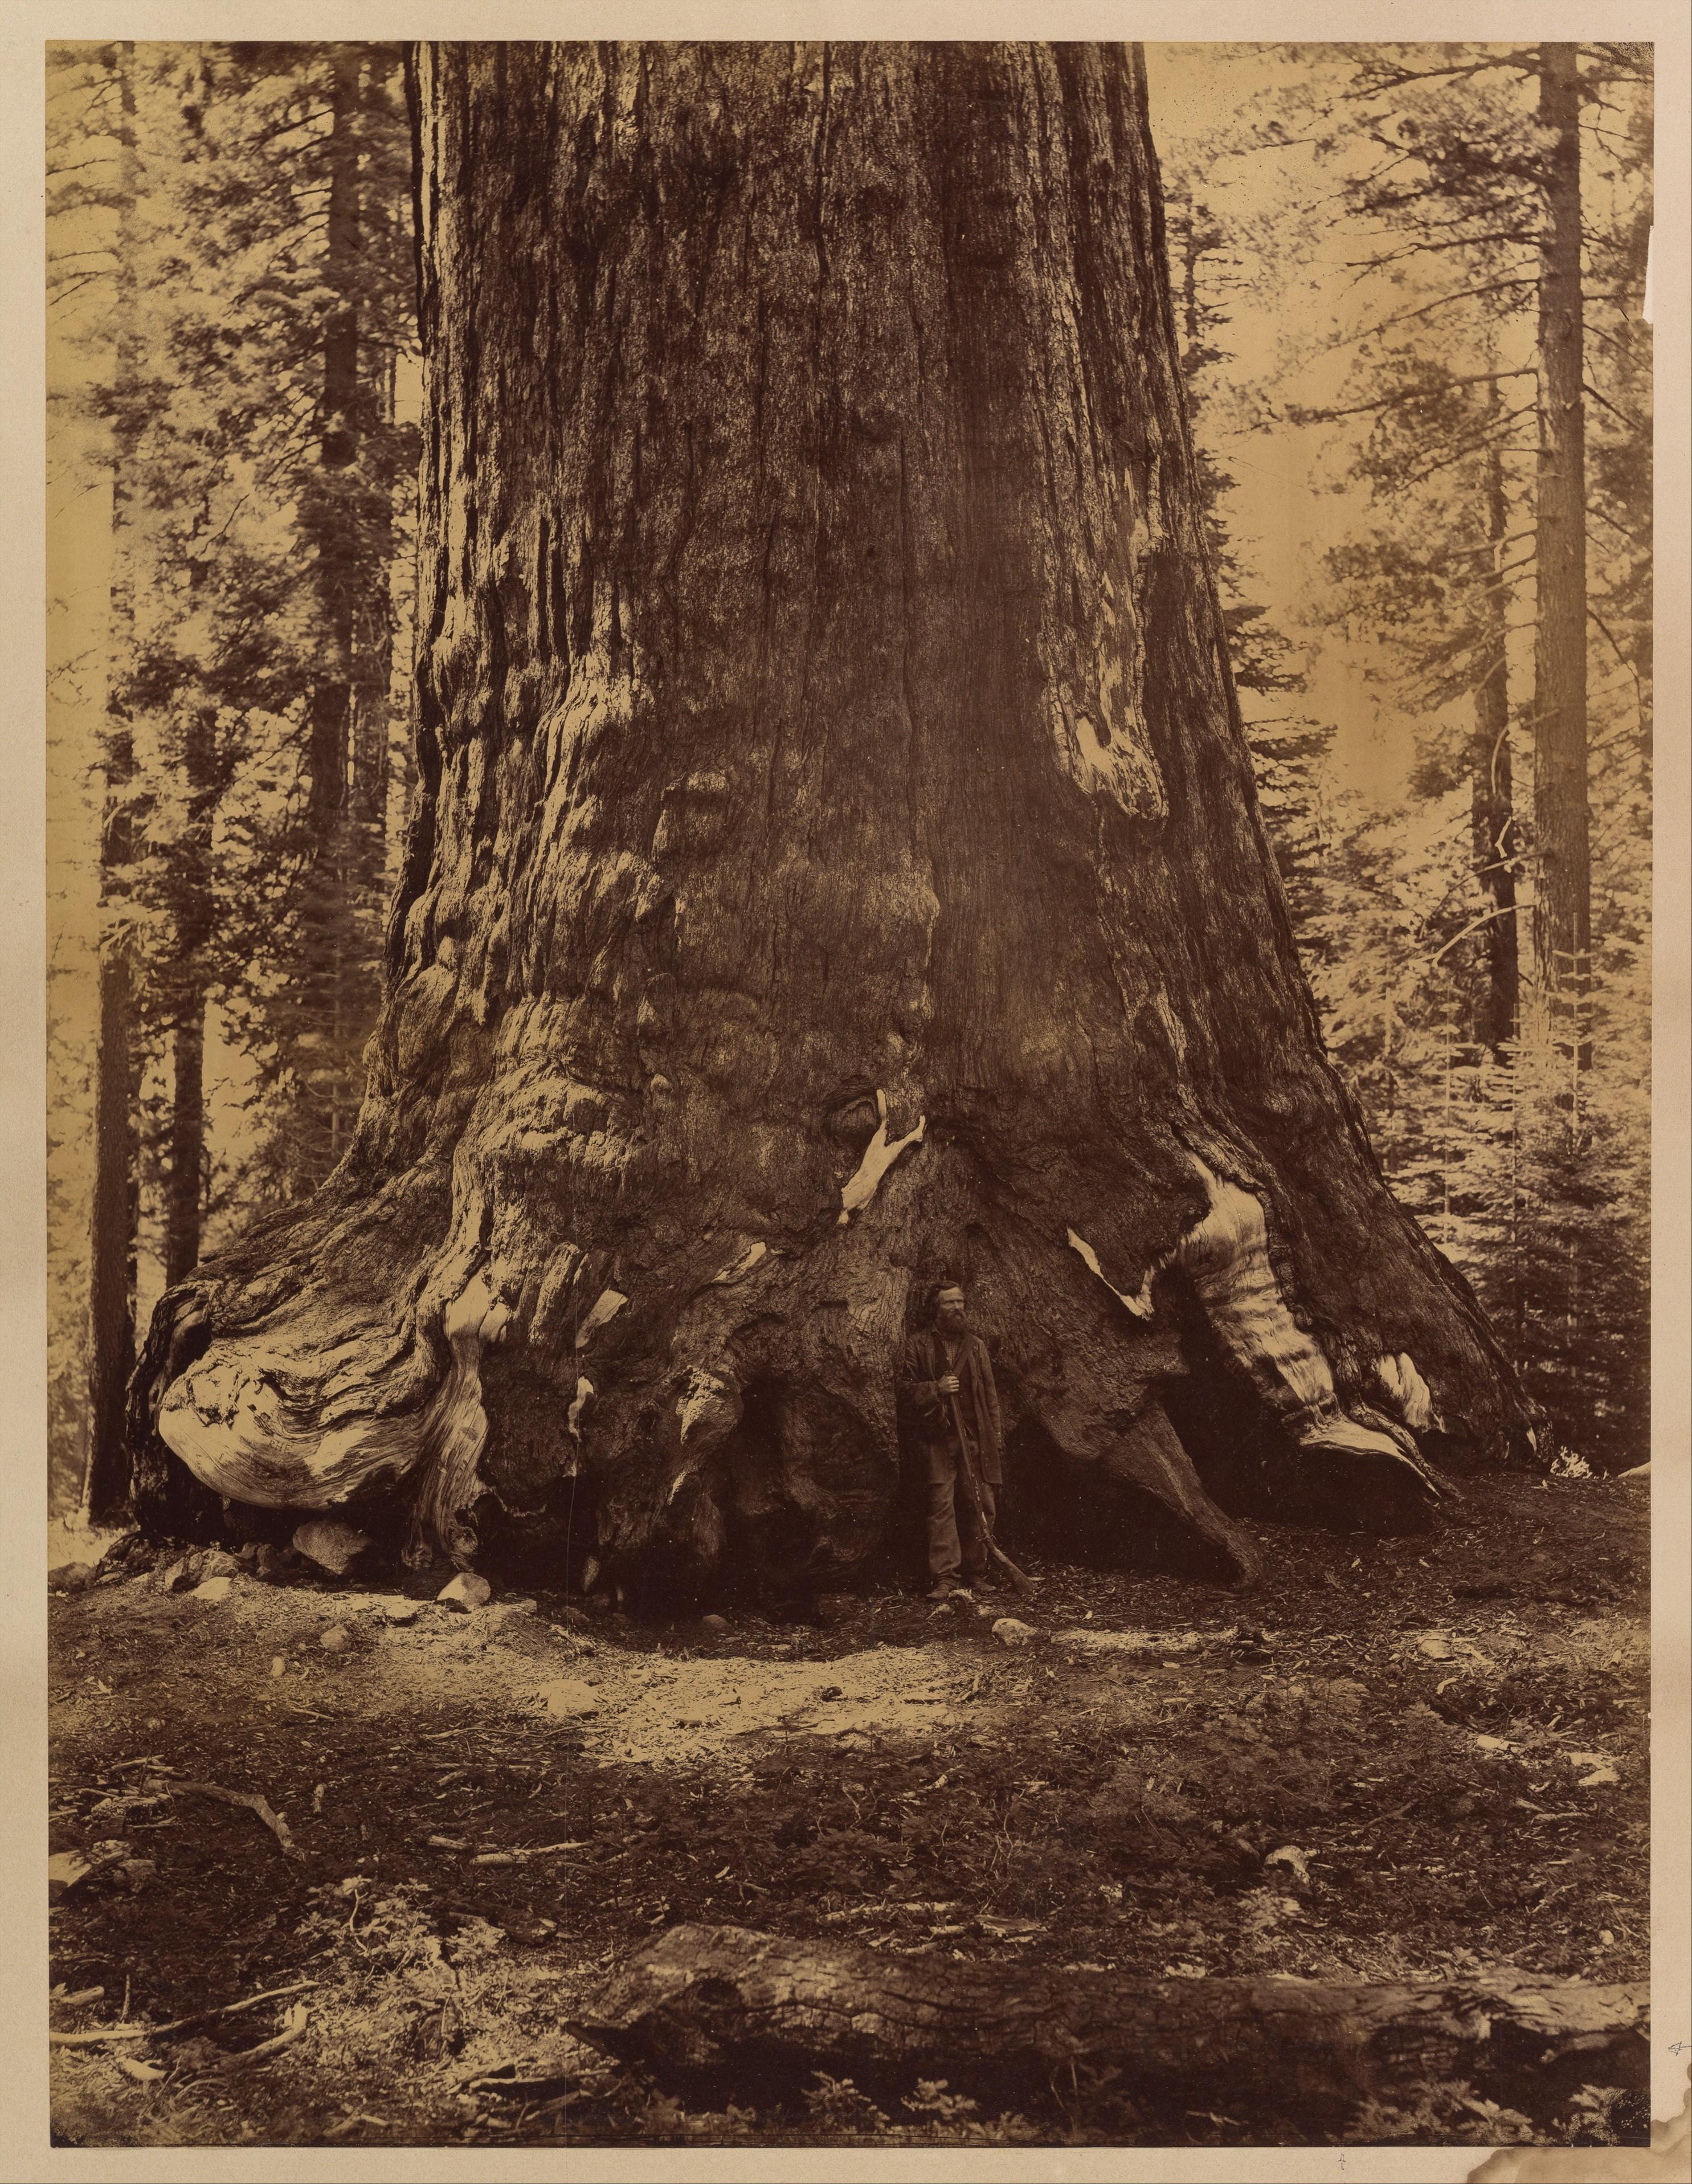 Fotó: Carleton Watkins: Section of the Grizzly Giant with Galen Clark, Mariposa Grove, Yosemite, 1865–66 © Carleton Watkins / The Metropolitan Museum of Art